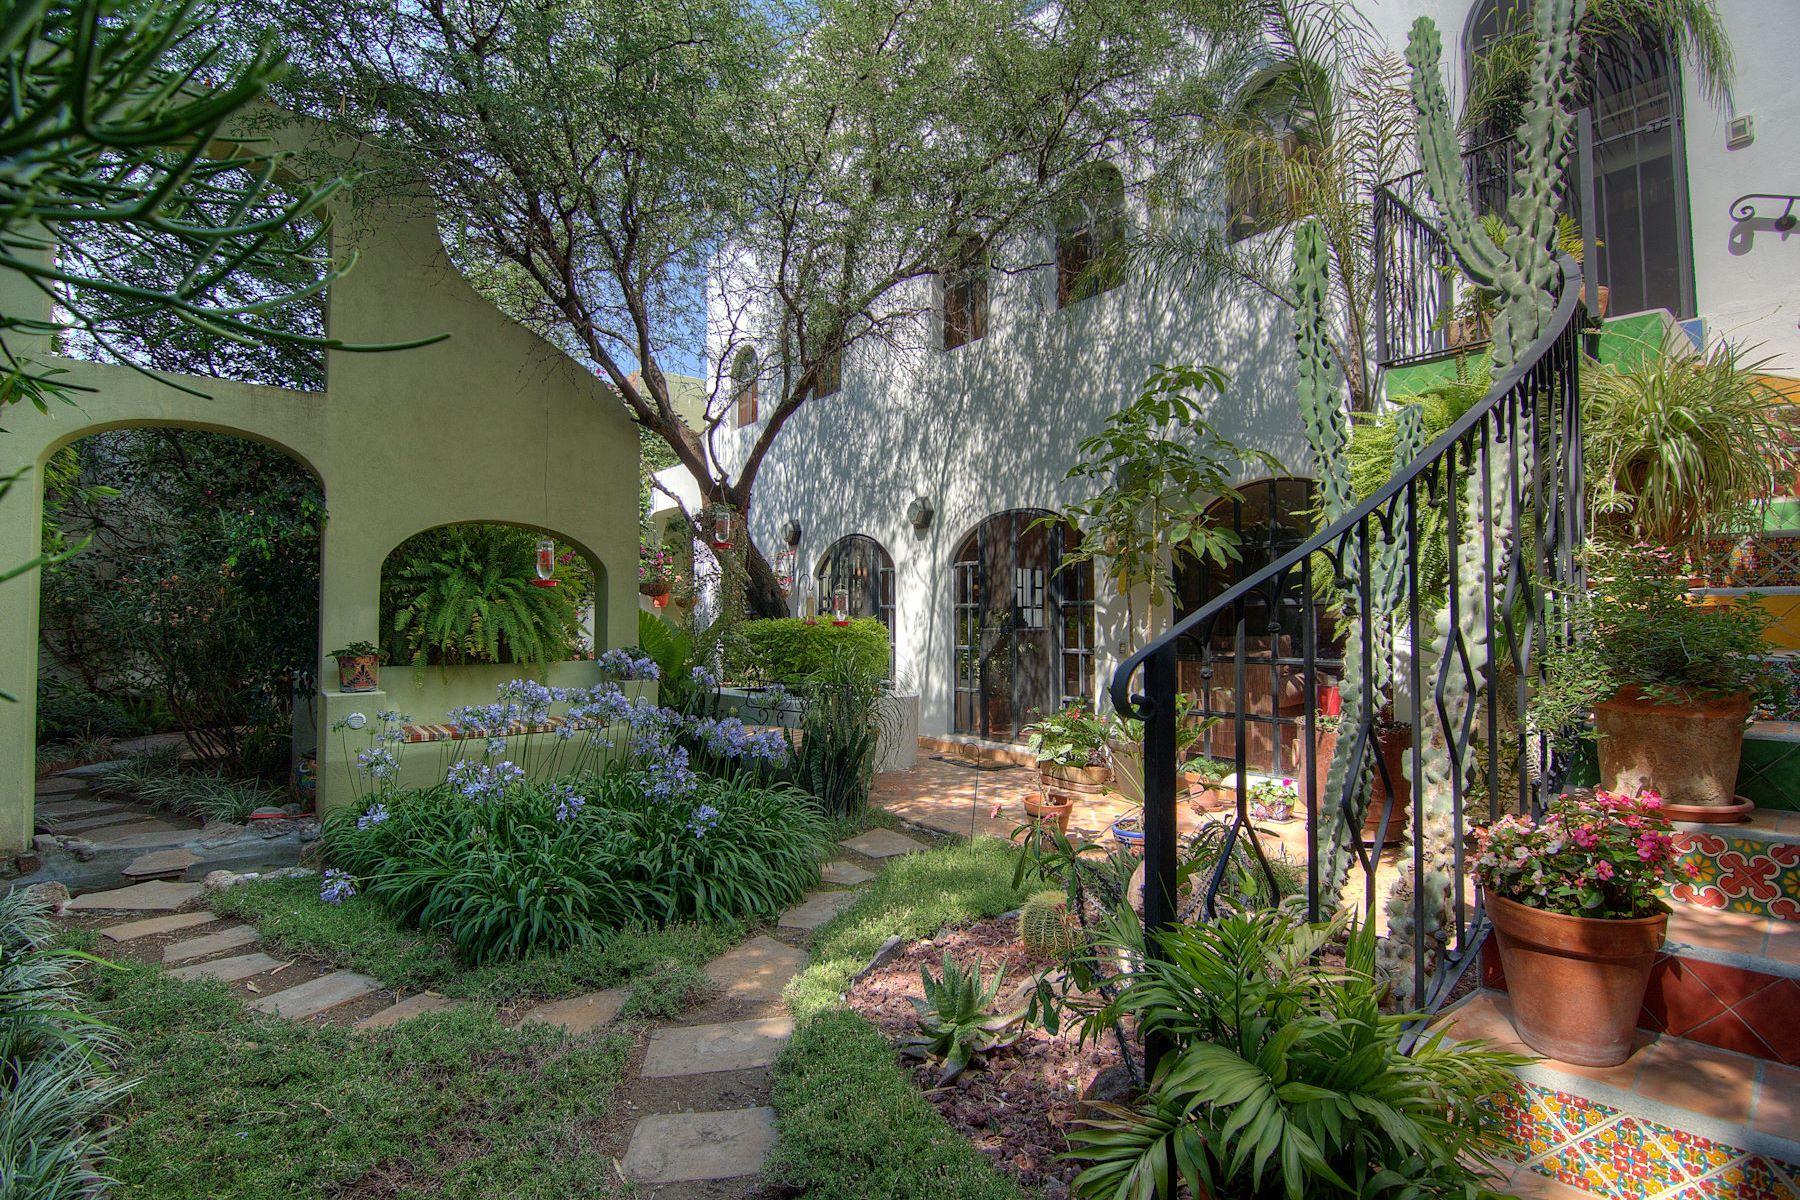 Single Family Home for Sale at Casa Bello Jardin San Miguel De Allende, Guanajuato Mexico